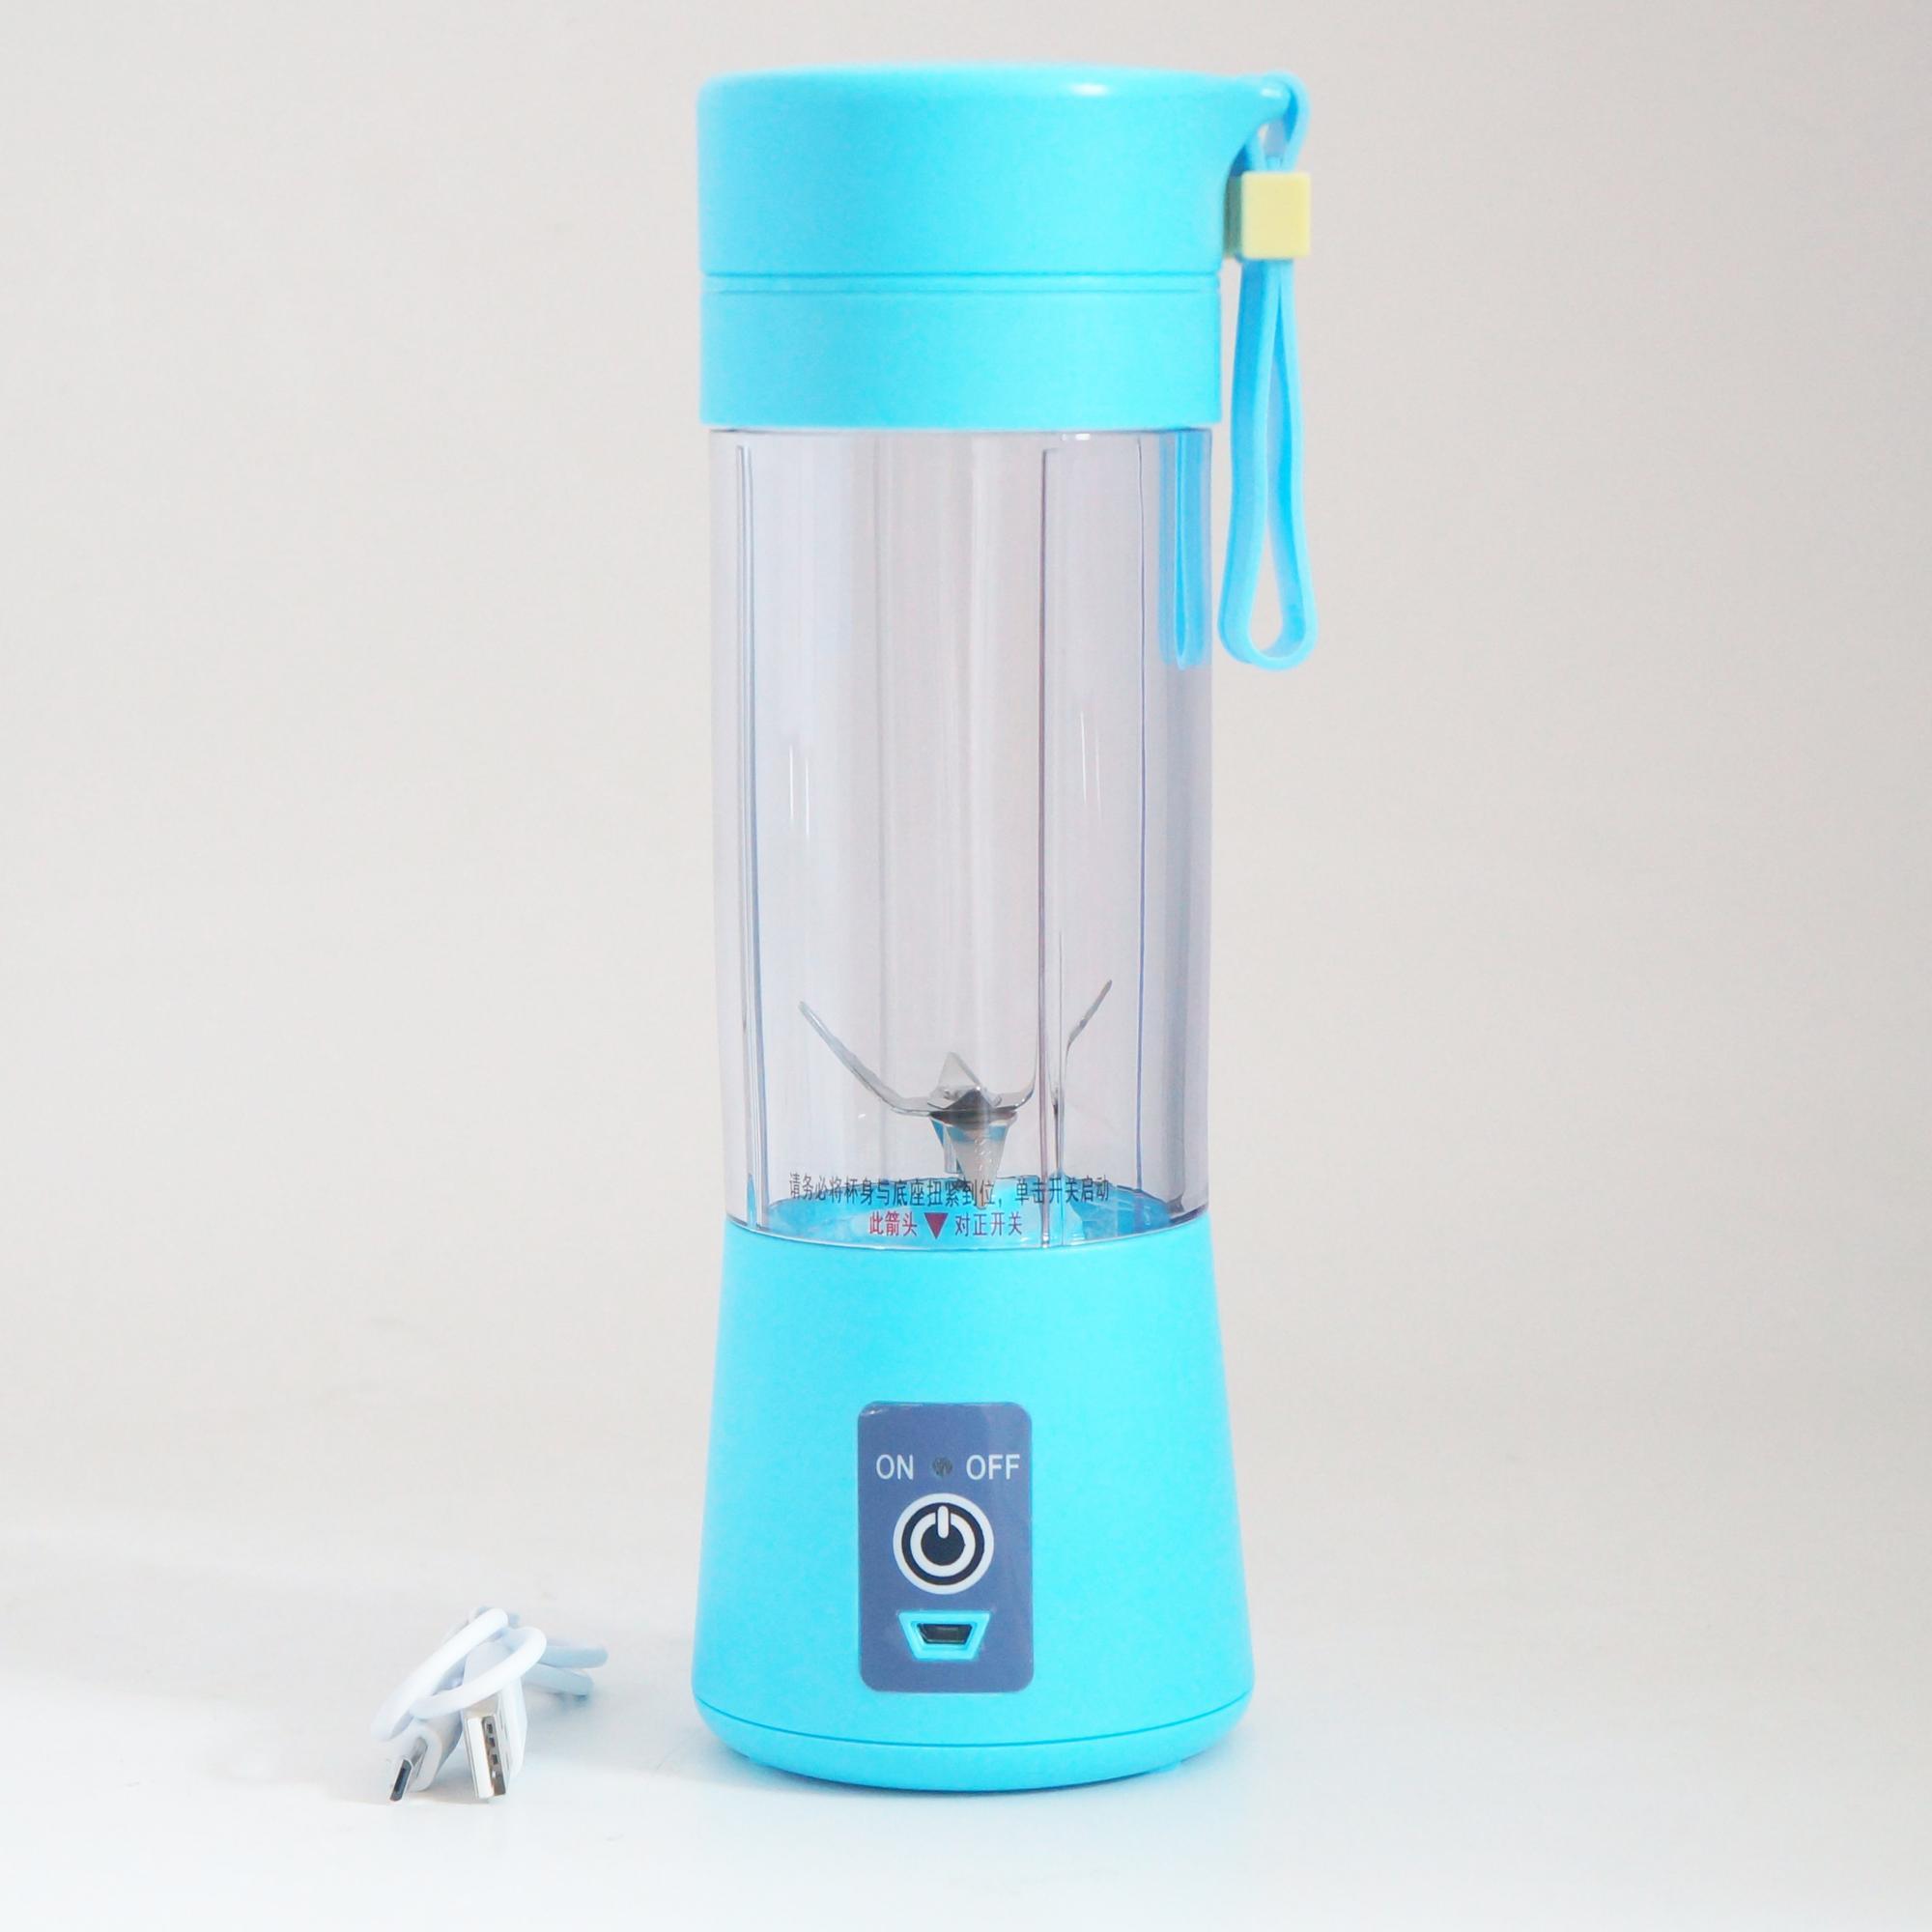 China electric hand juicer wholesale 🇨🇳 - Alibaba